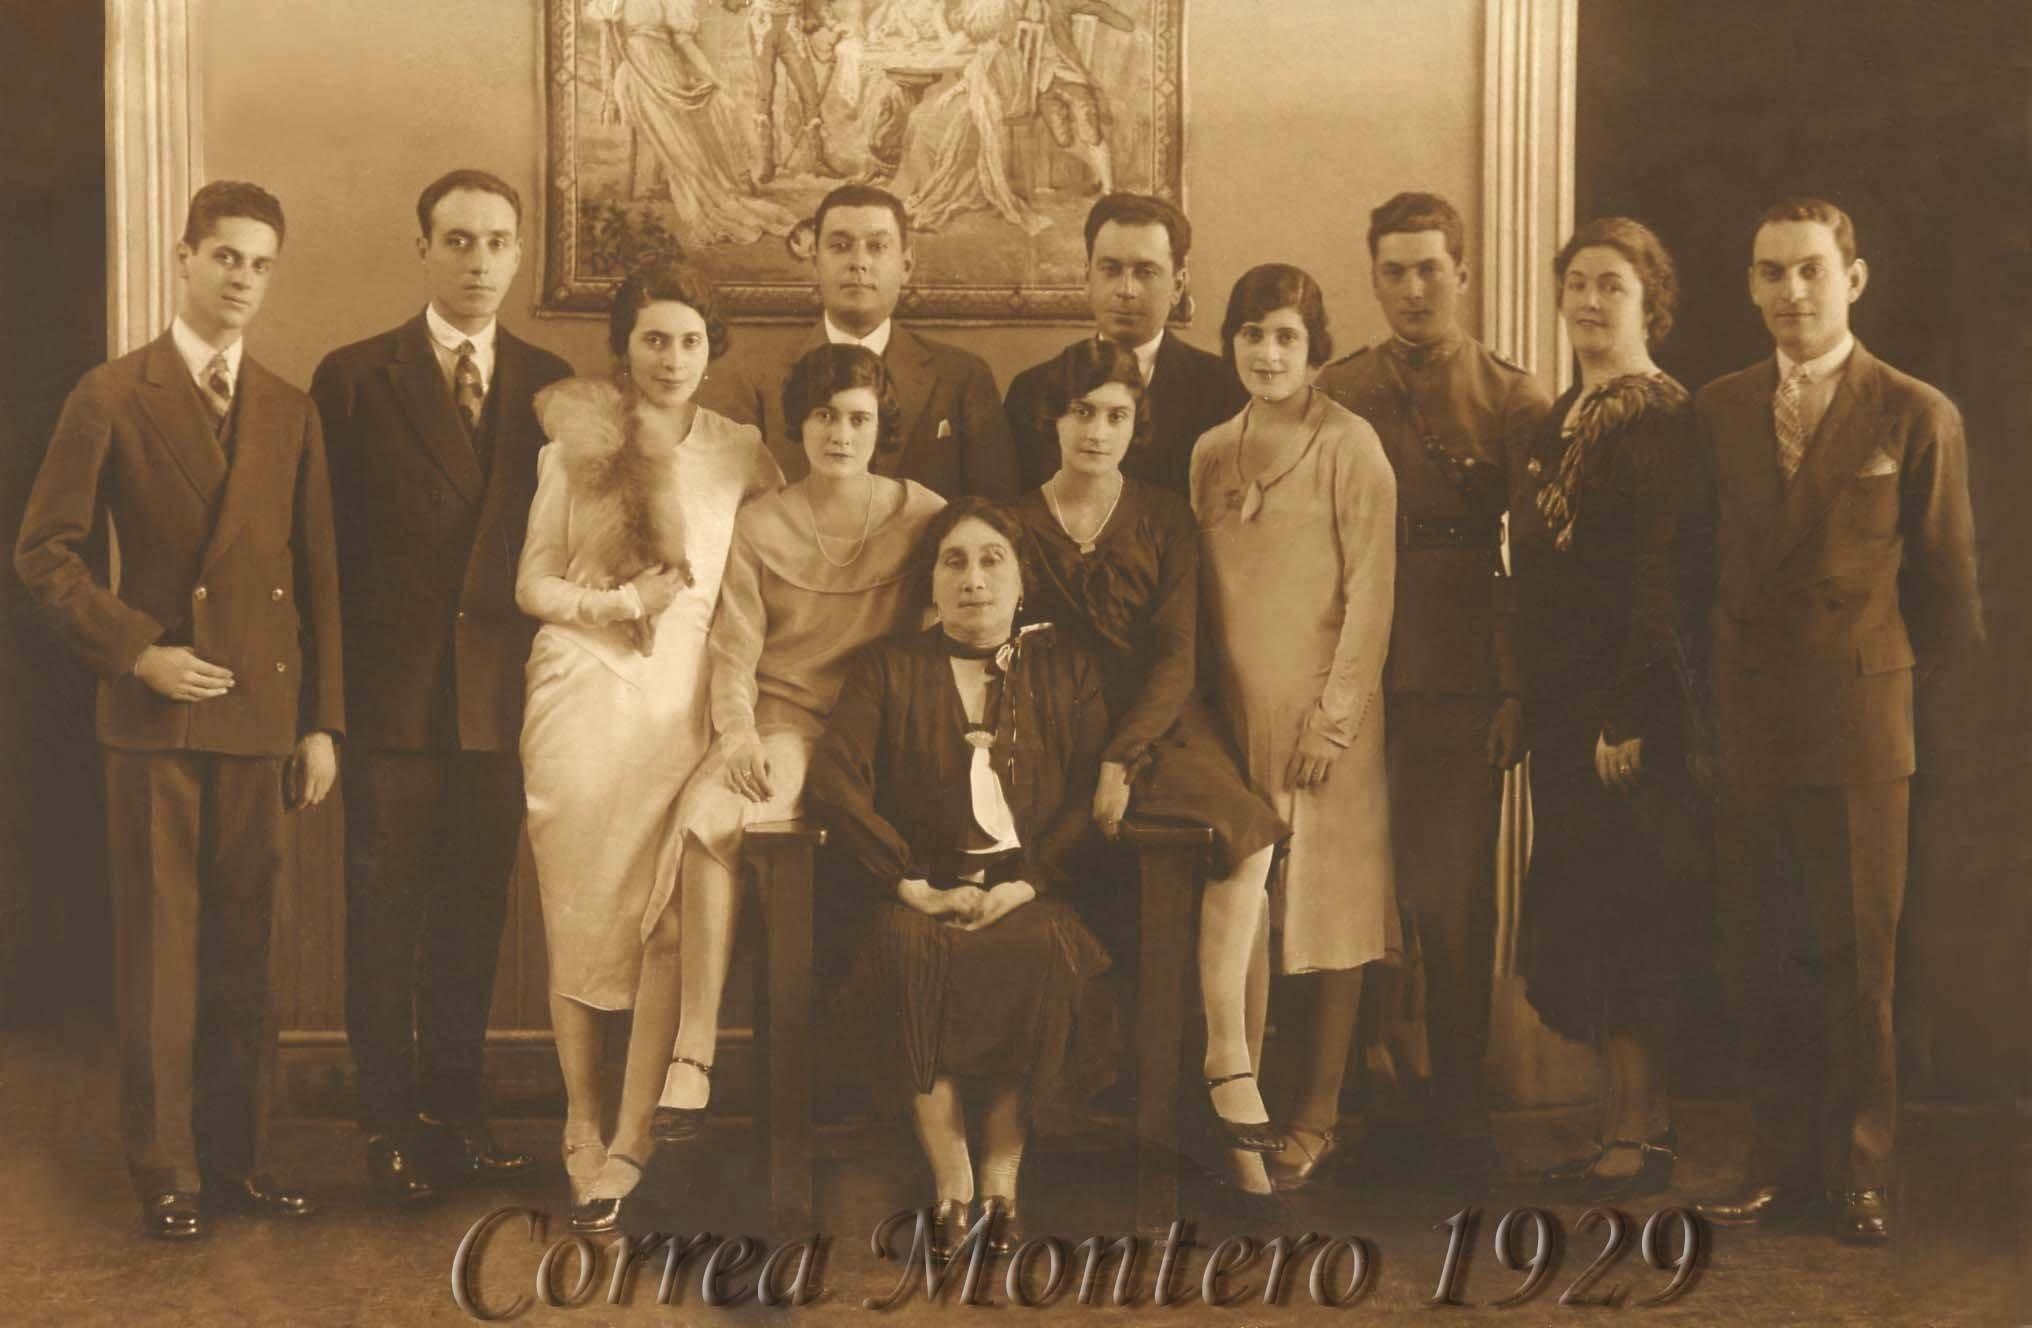 Argentina monica h de cordoba capital de 20 barrio crisol norte - 1 4